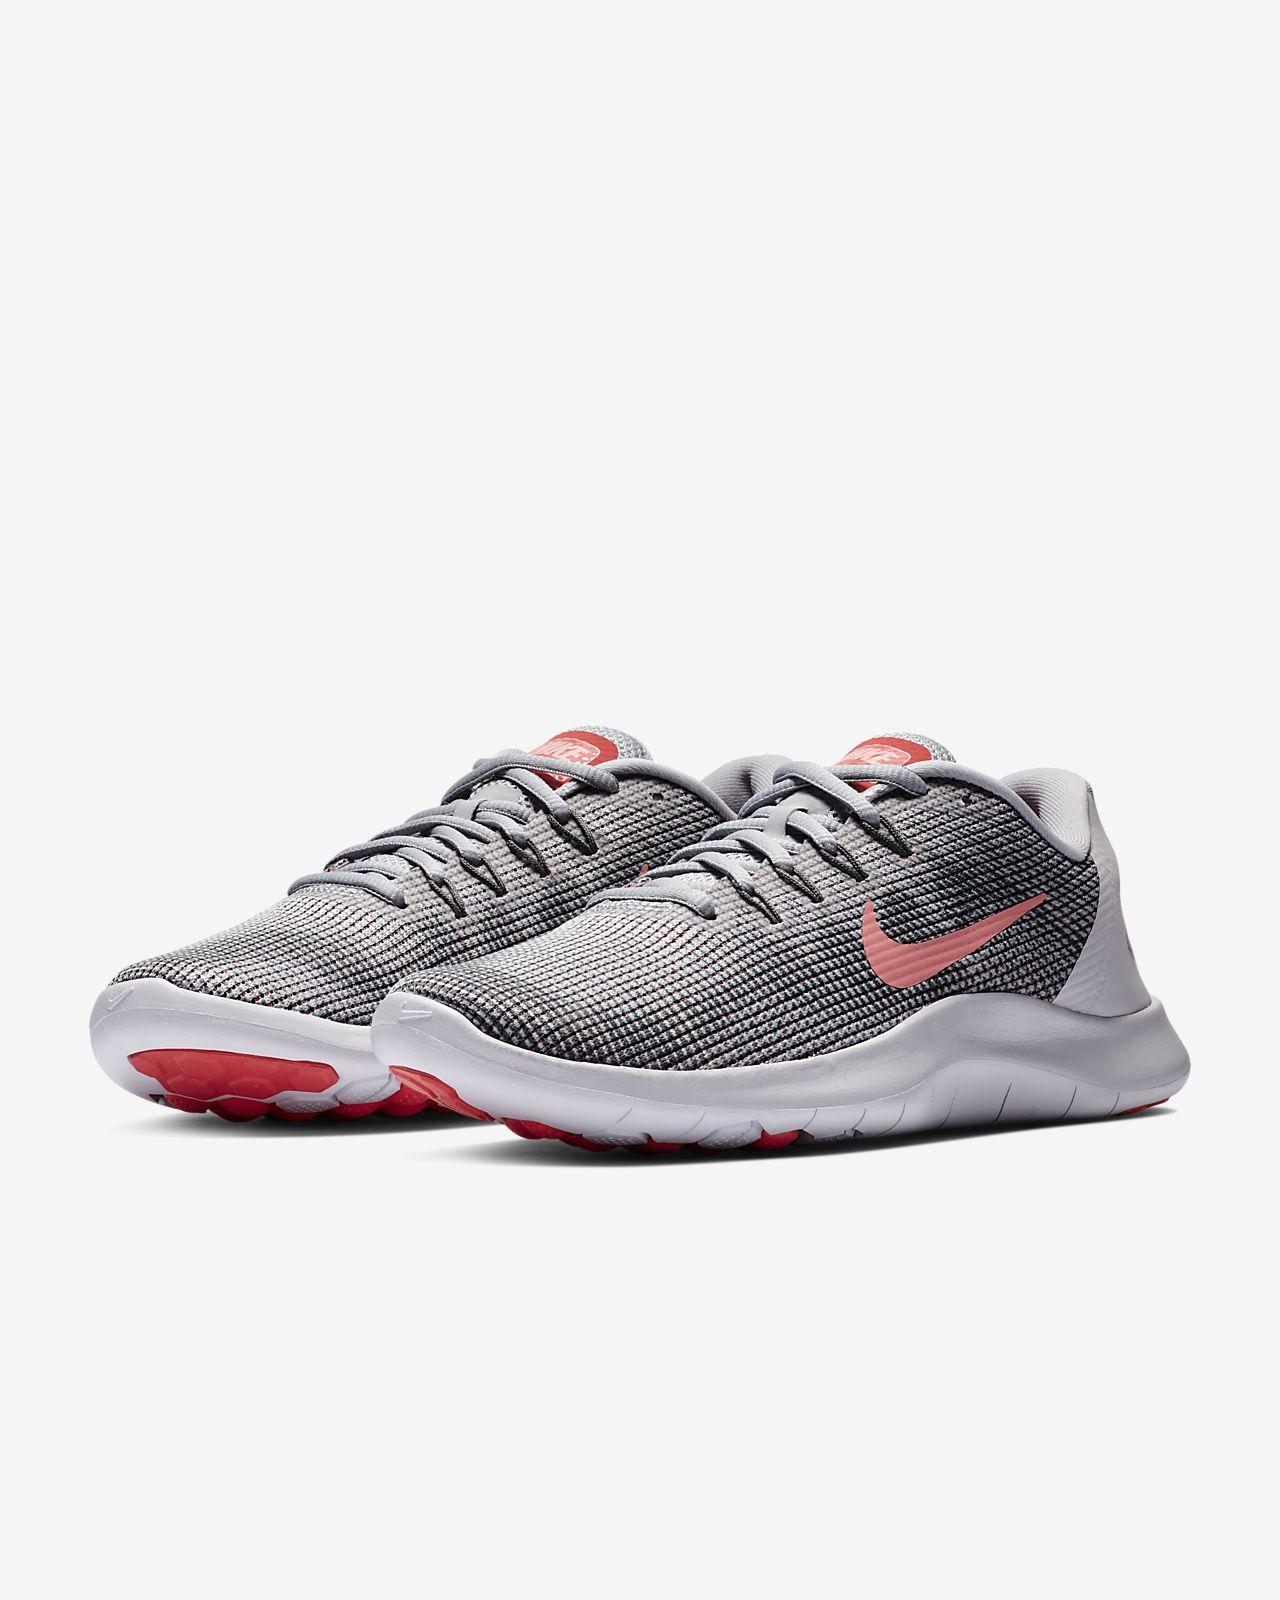 b8f861296975ac Nike Flex RN 2018 Women s Running Shoe. Nike.com AT